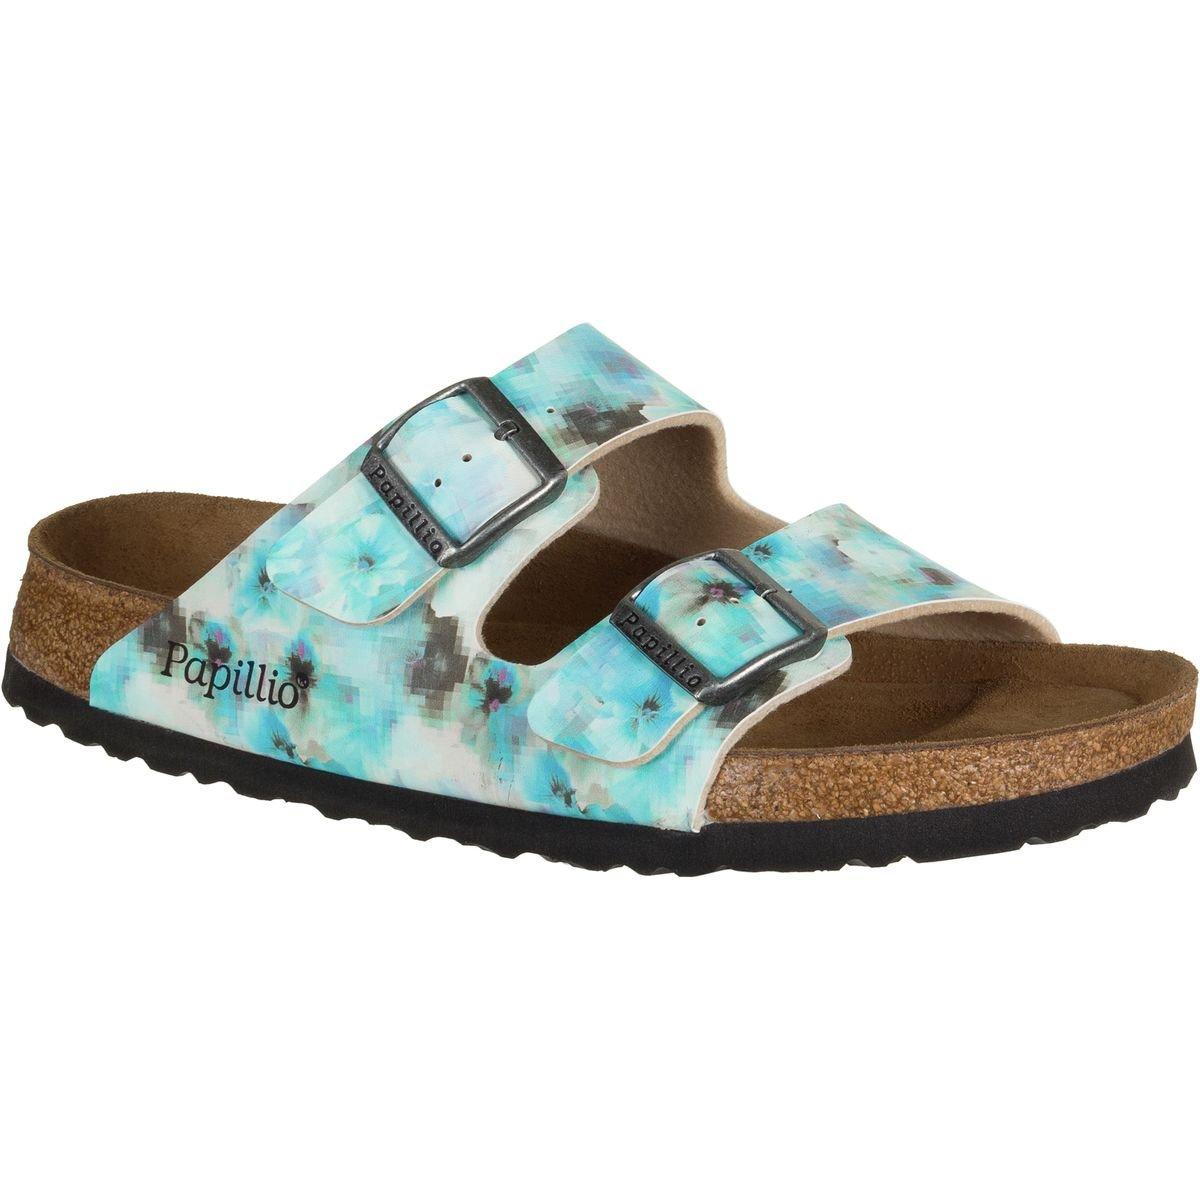 7fd311156b3b3 Birkenstock Unisex Arizona Pixel Blue Birko-flor Sandals - 11-11.5 2A(N) US  Women/9-9.5 D(M) US Men